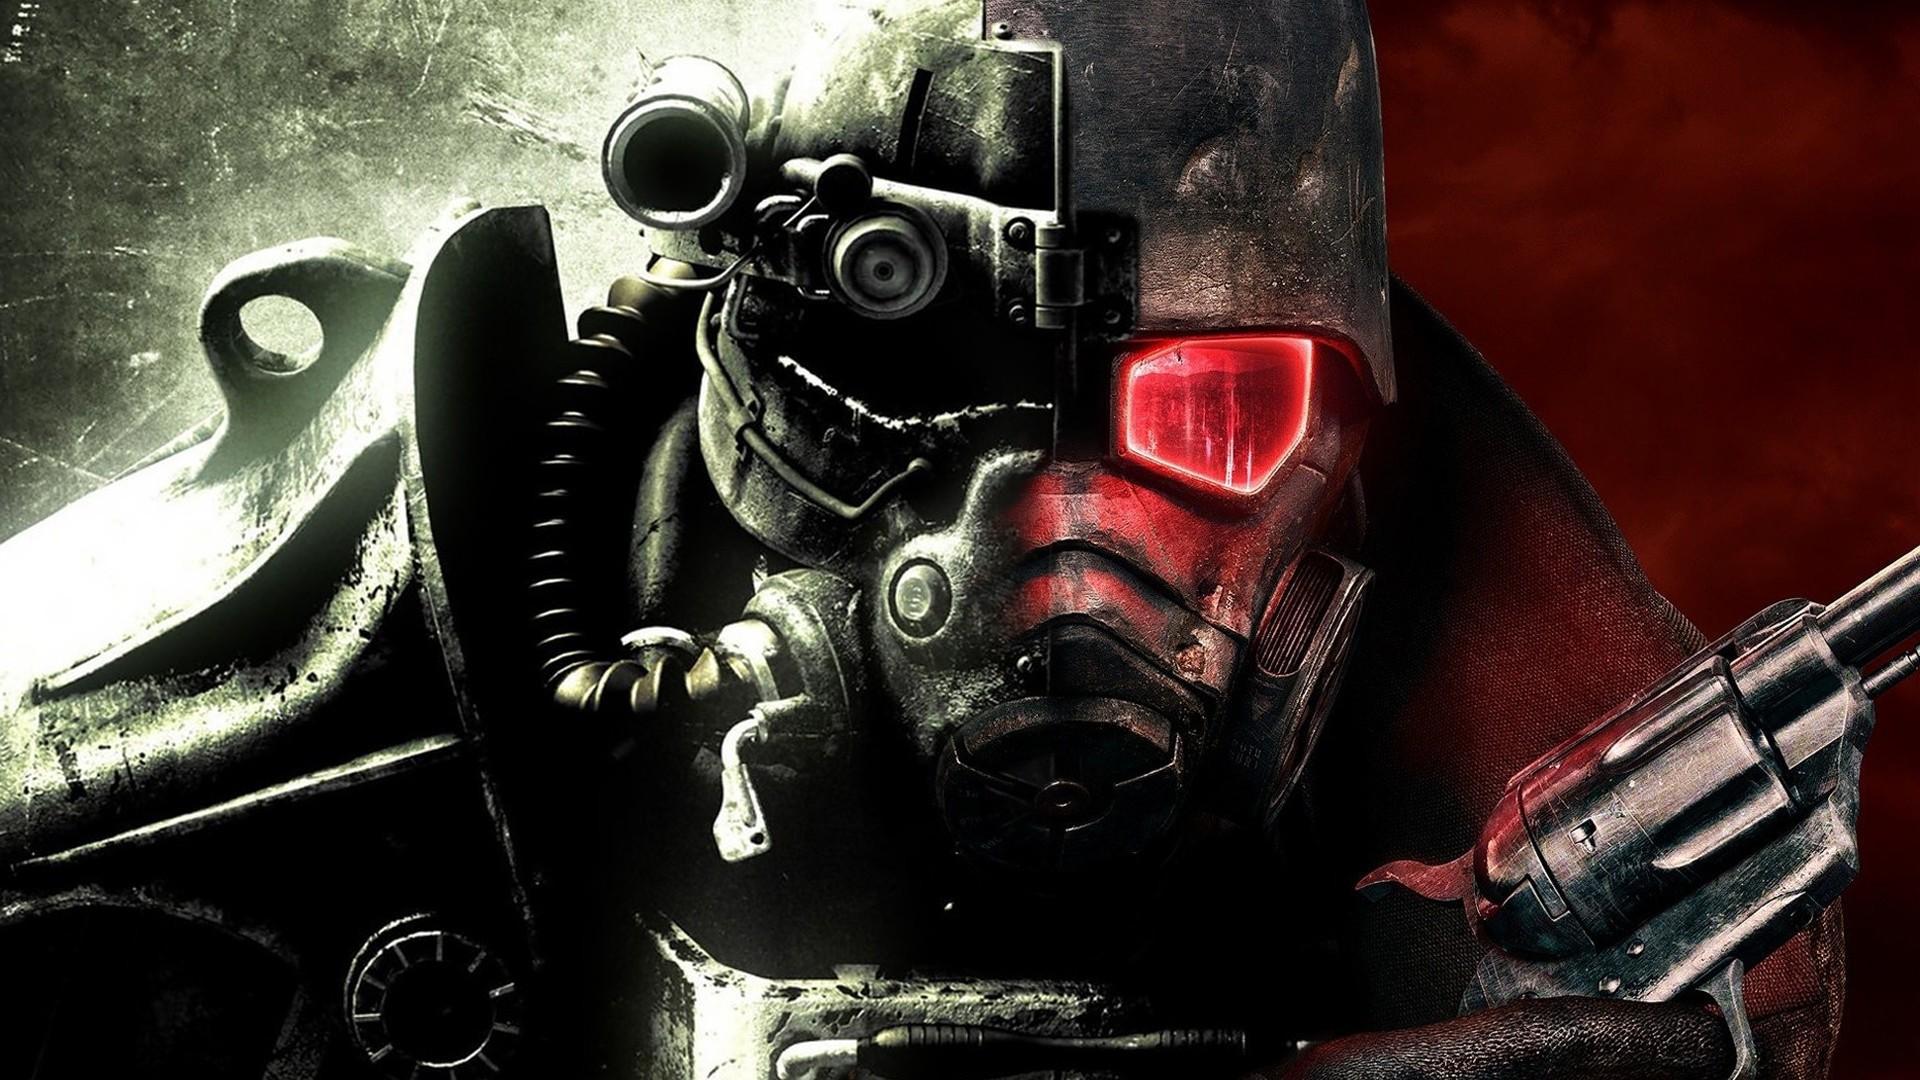 Gas Mask Girl Wallpaper Fallout Fallout New Vegas Fallout 3 War Vault Tec